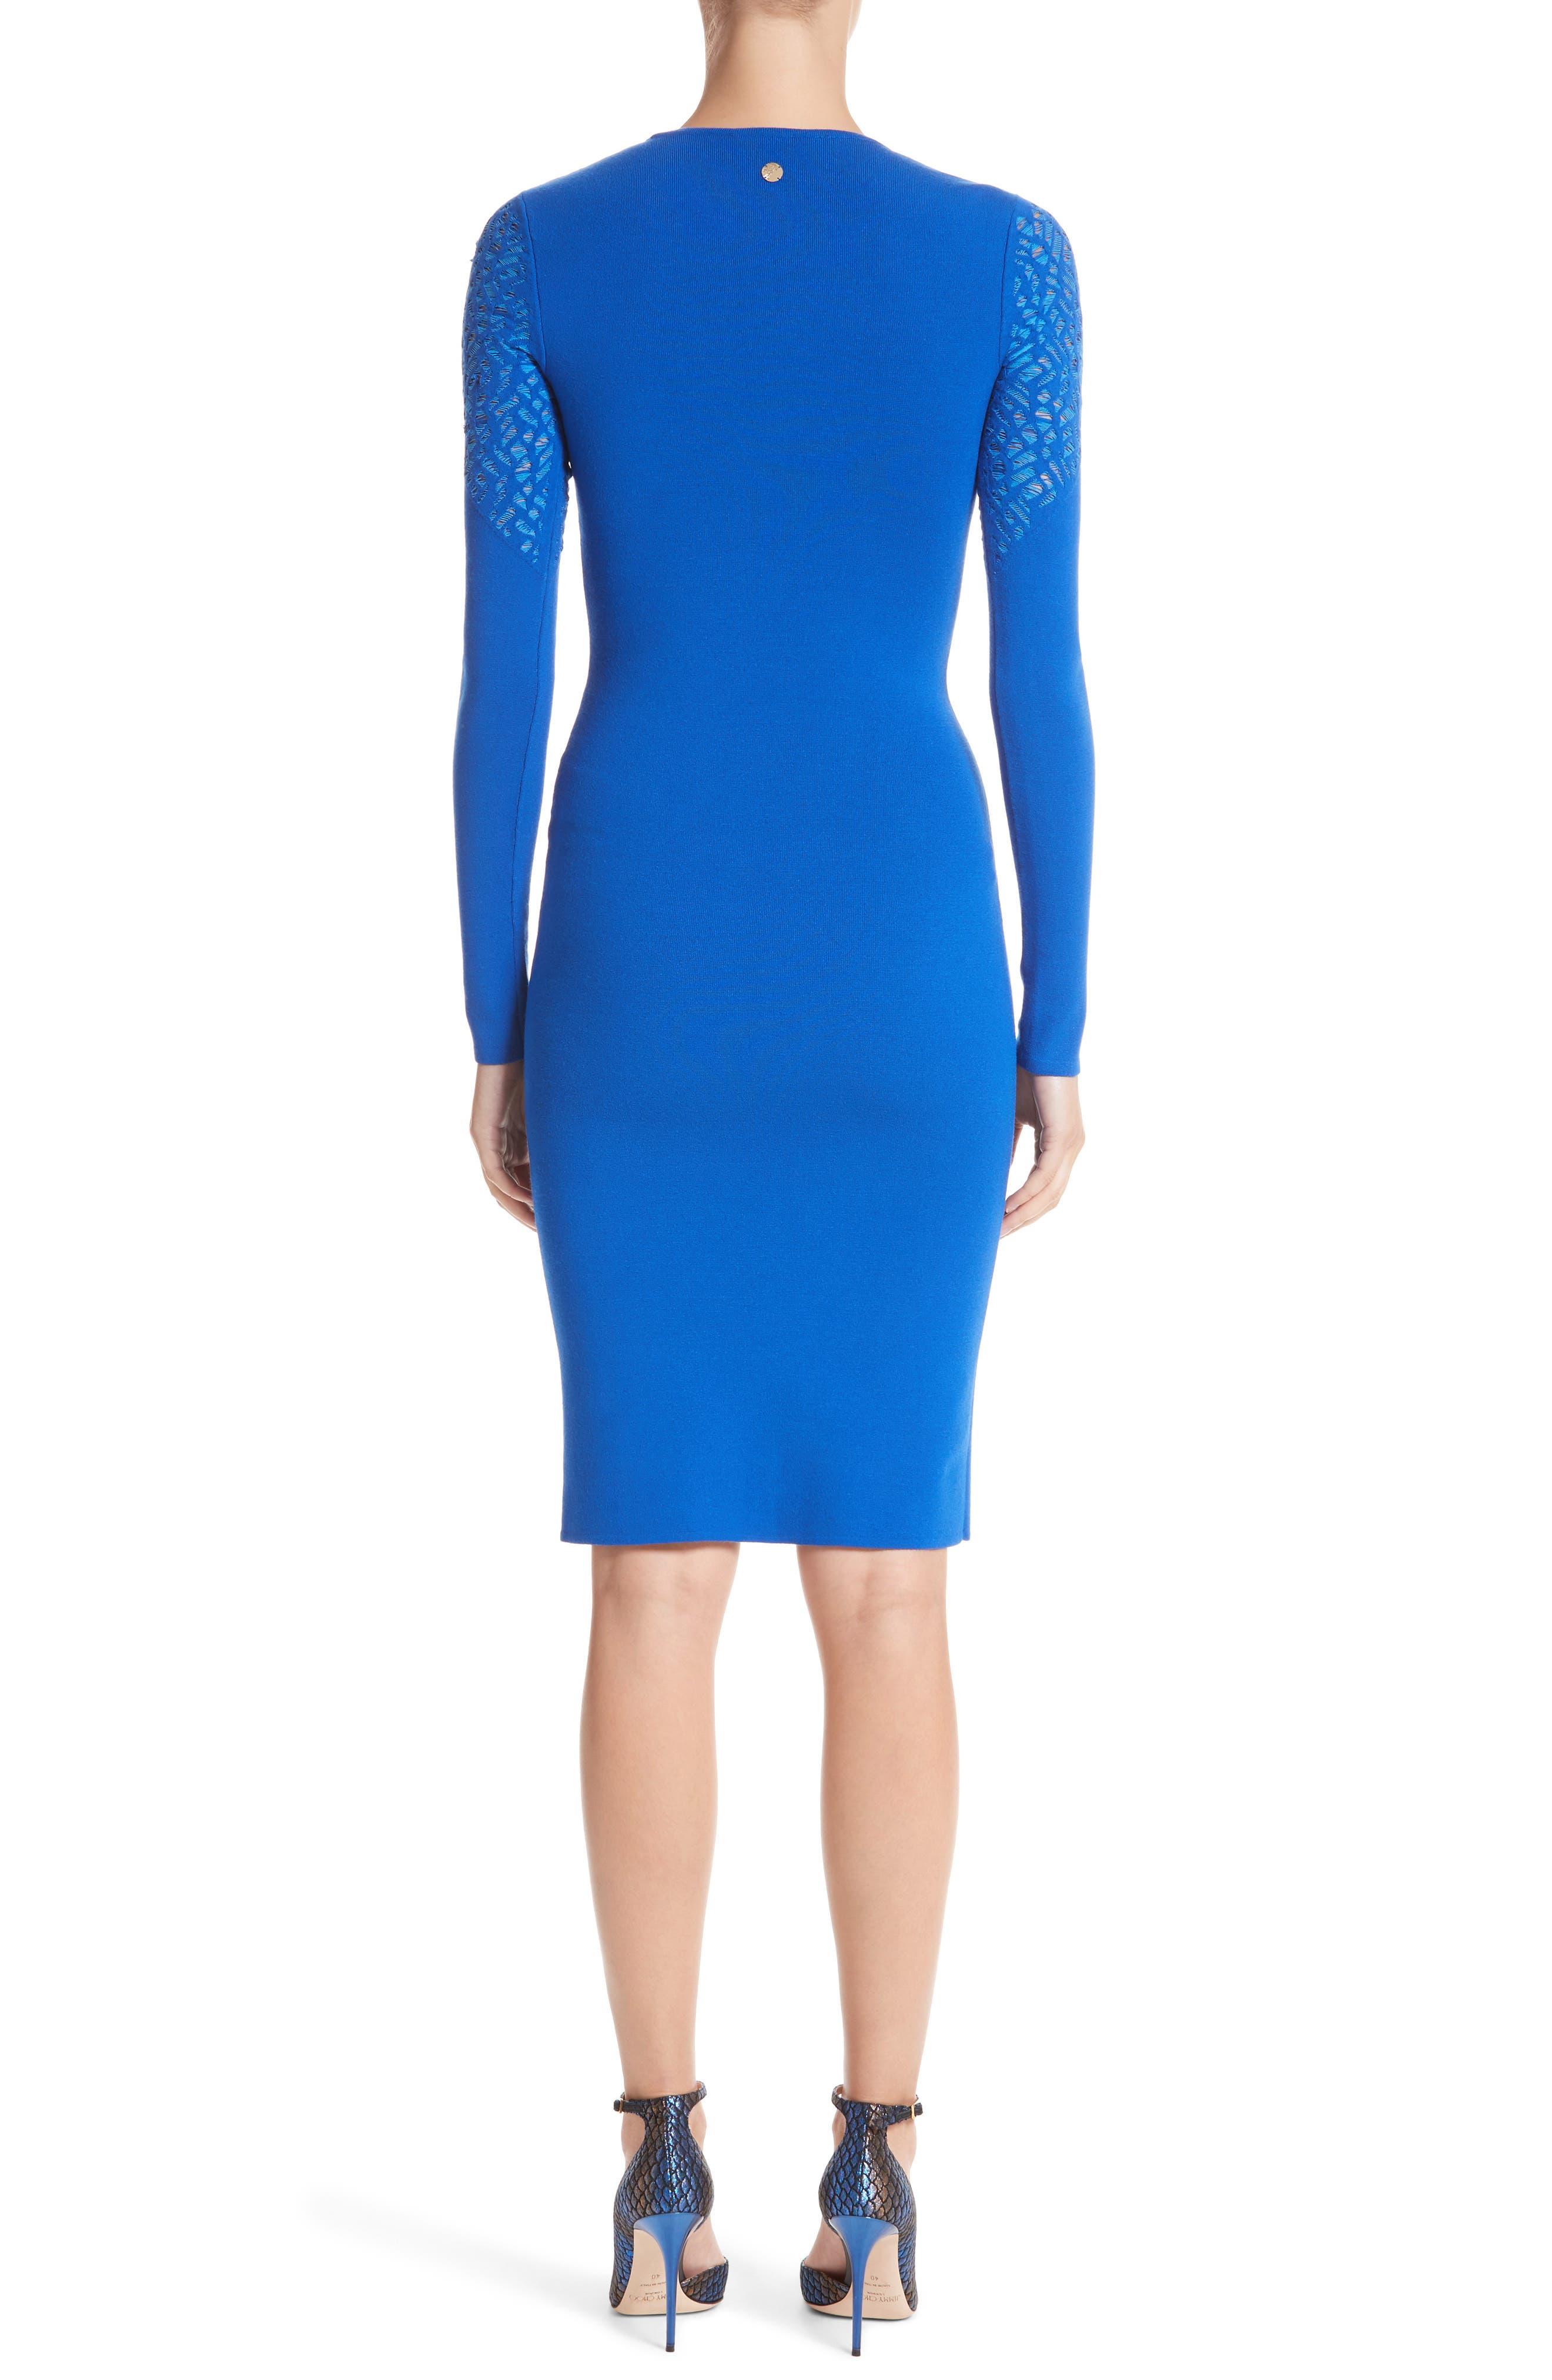 Contrast Stitch Knit Dress,                             Alternate thumbnail 2, color,                             Royal Blue/ Light Blue